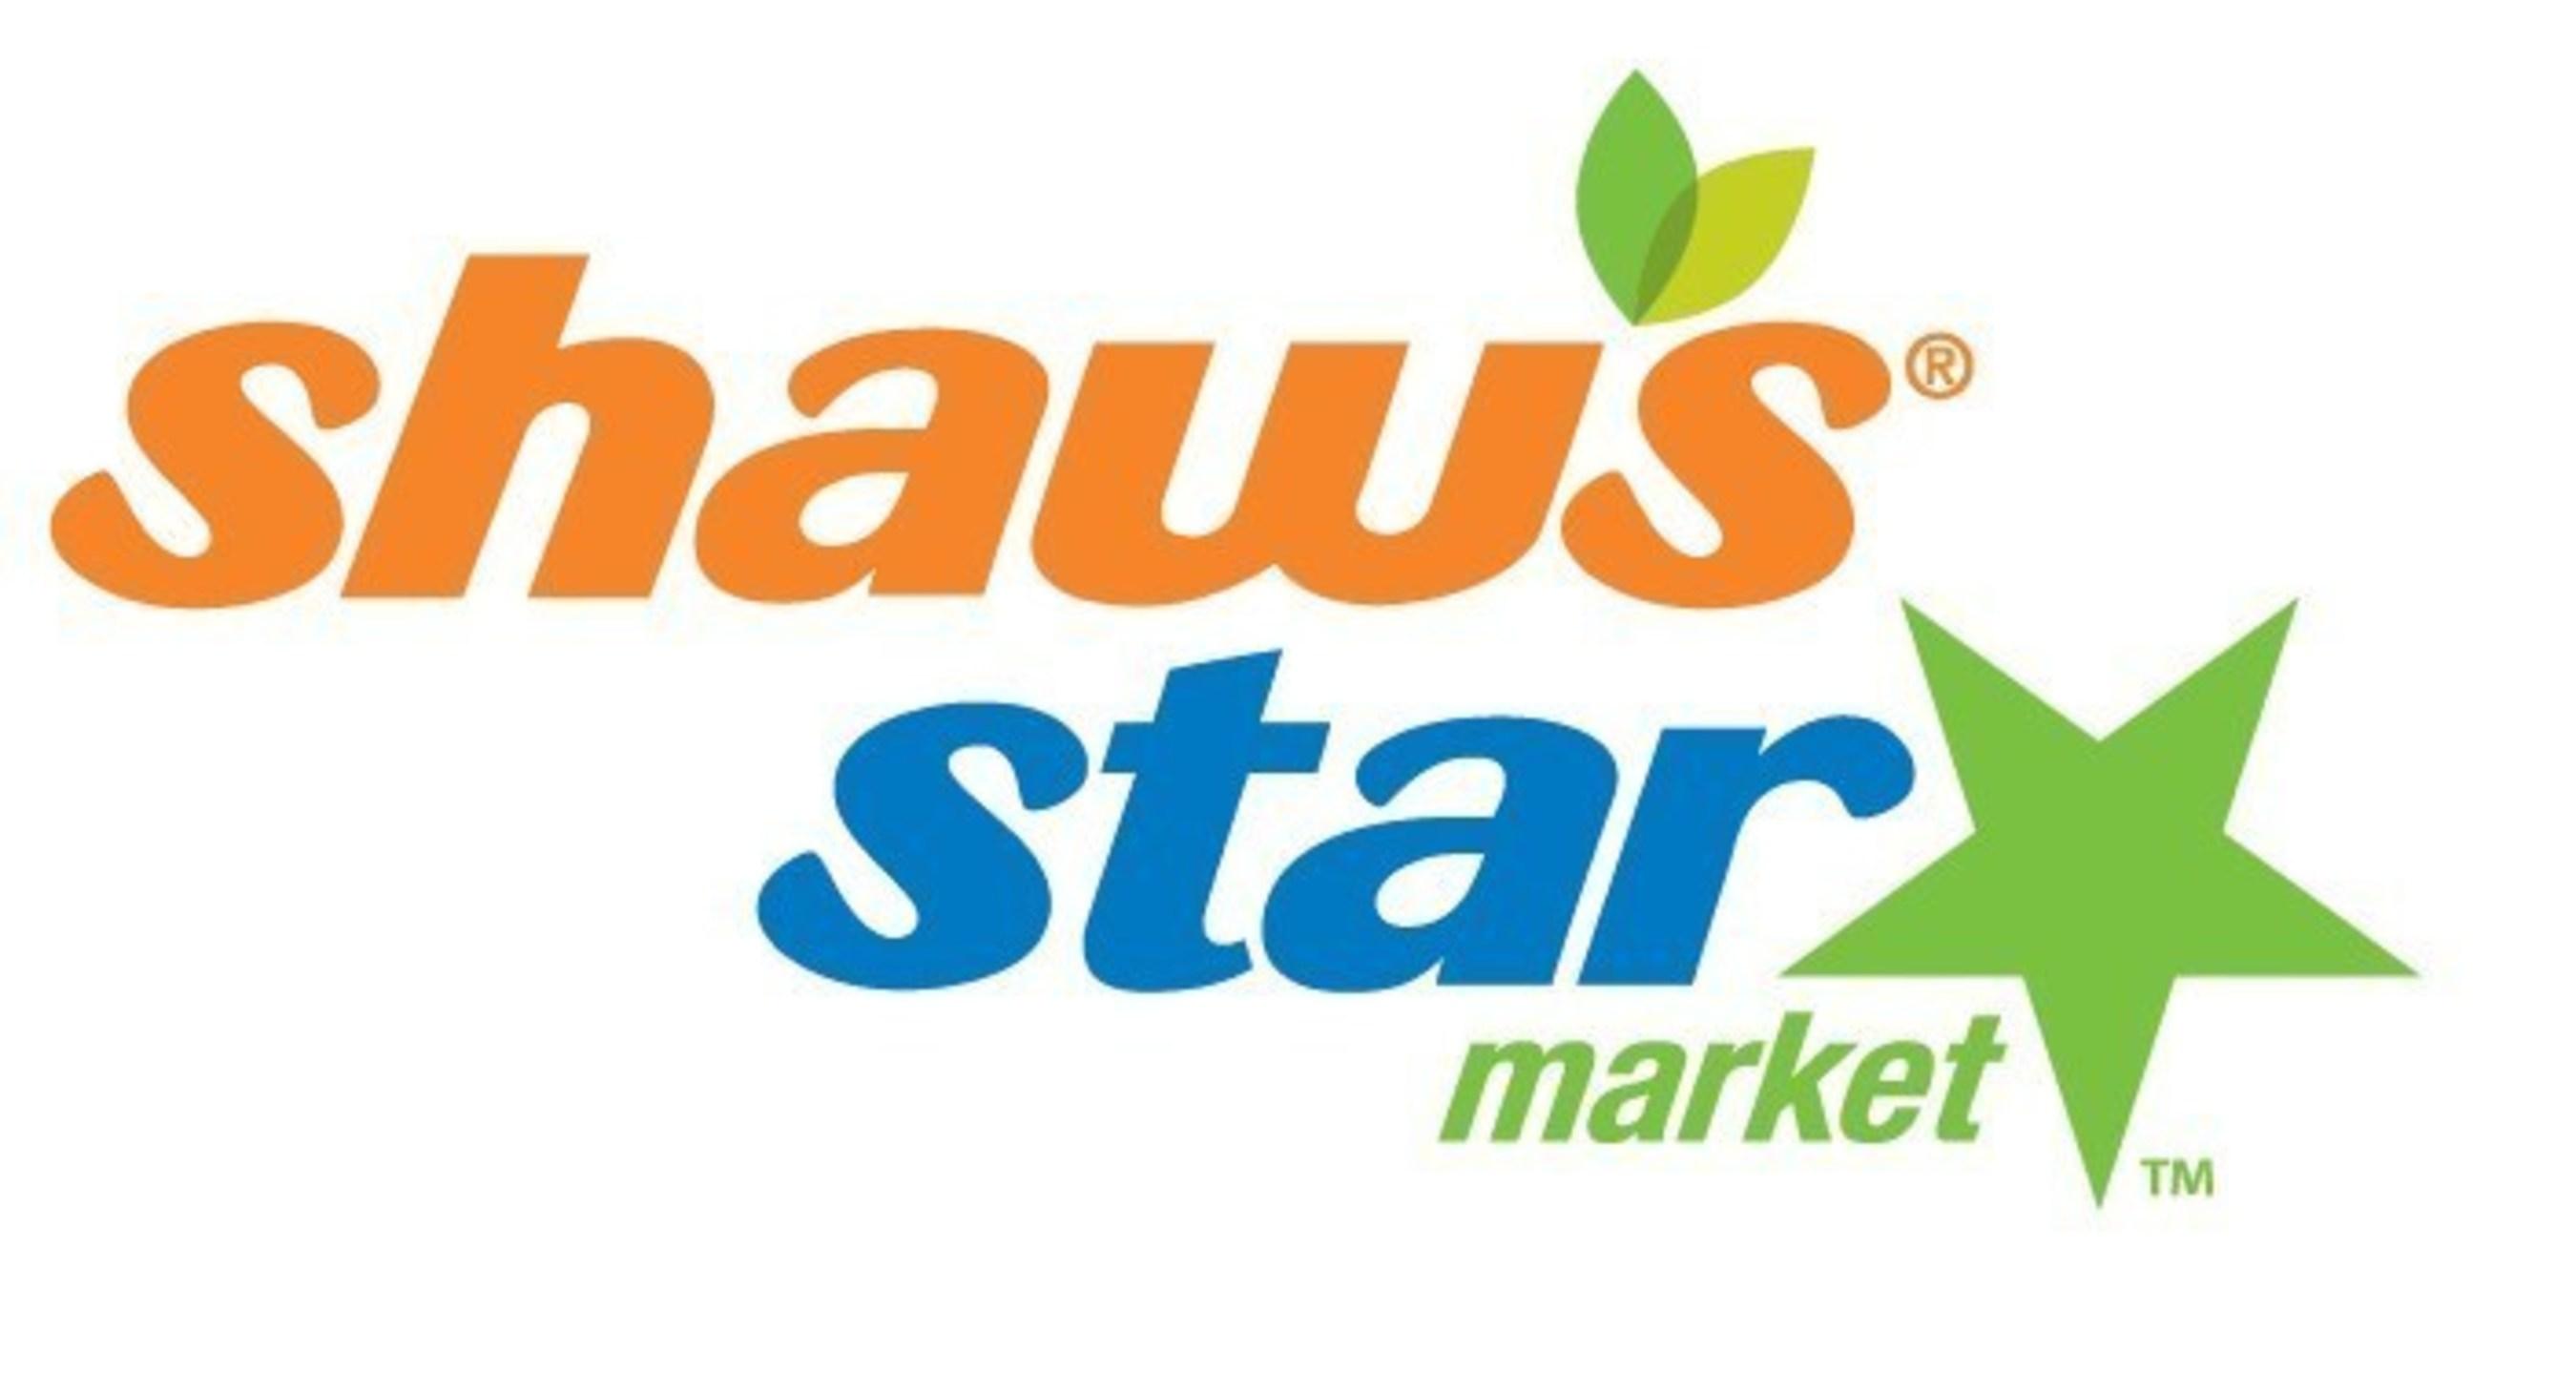 Shaw's & Star Market